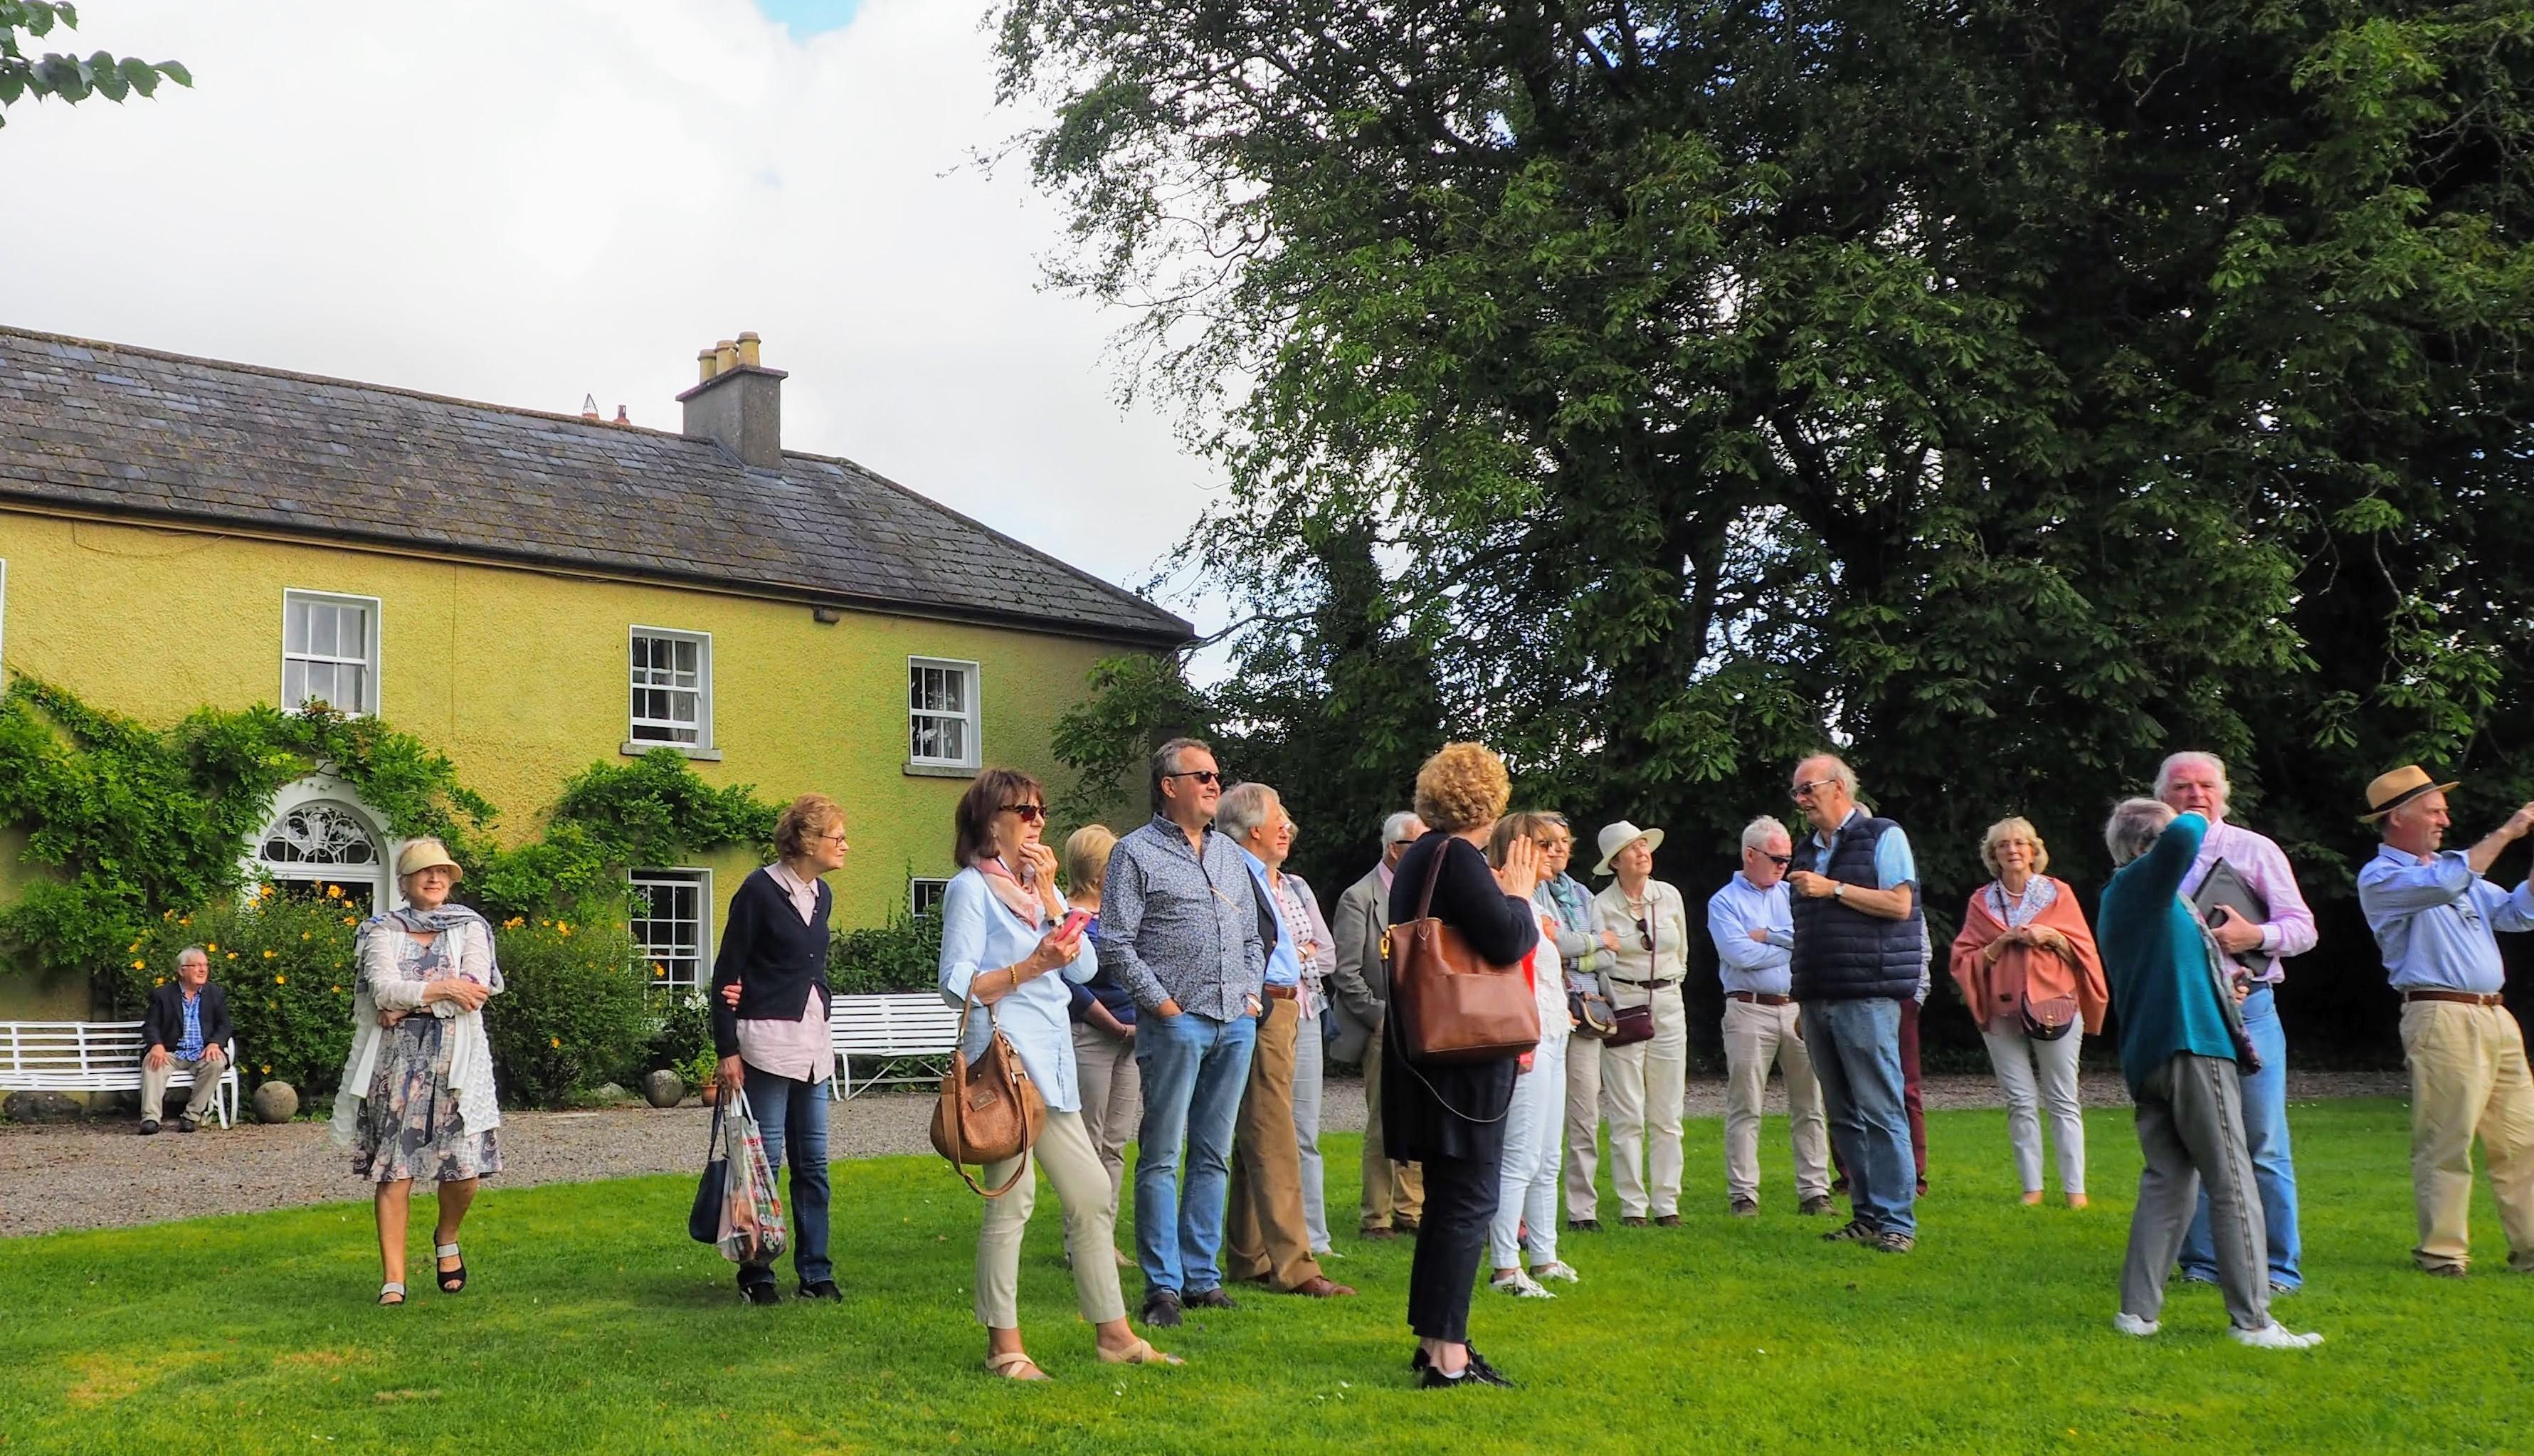 28-July-2019-visit-to-Larchill-Arcadian-gardens-with-owner-Michael-de-las-casas.jpg#asset:12702